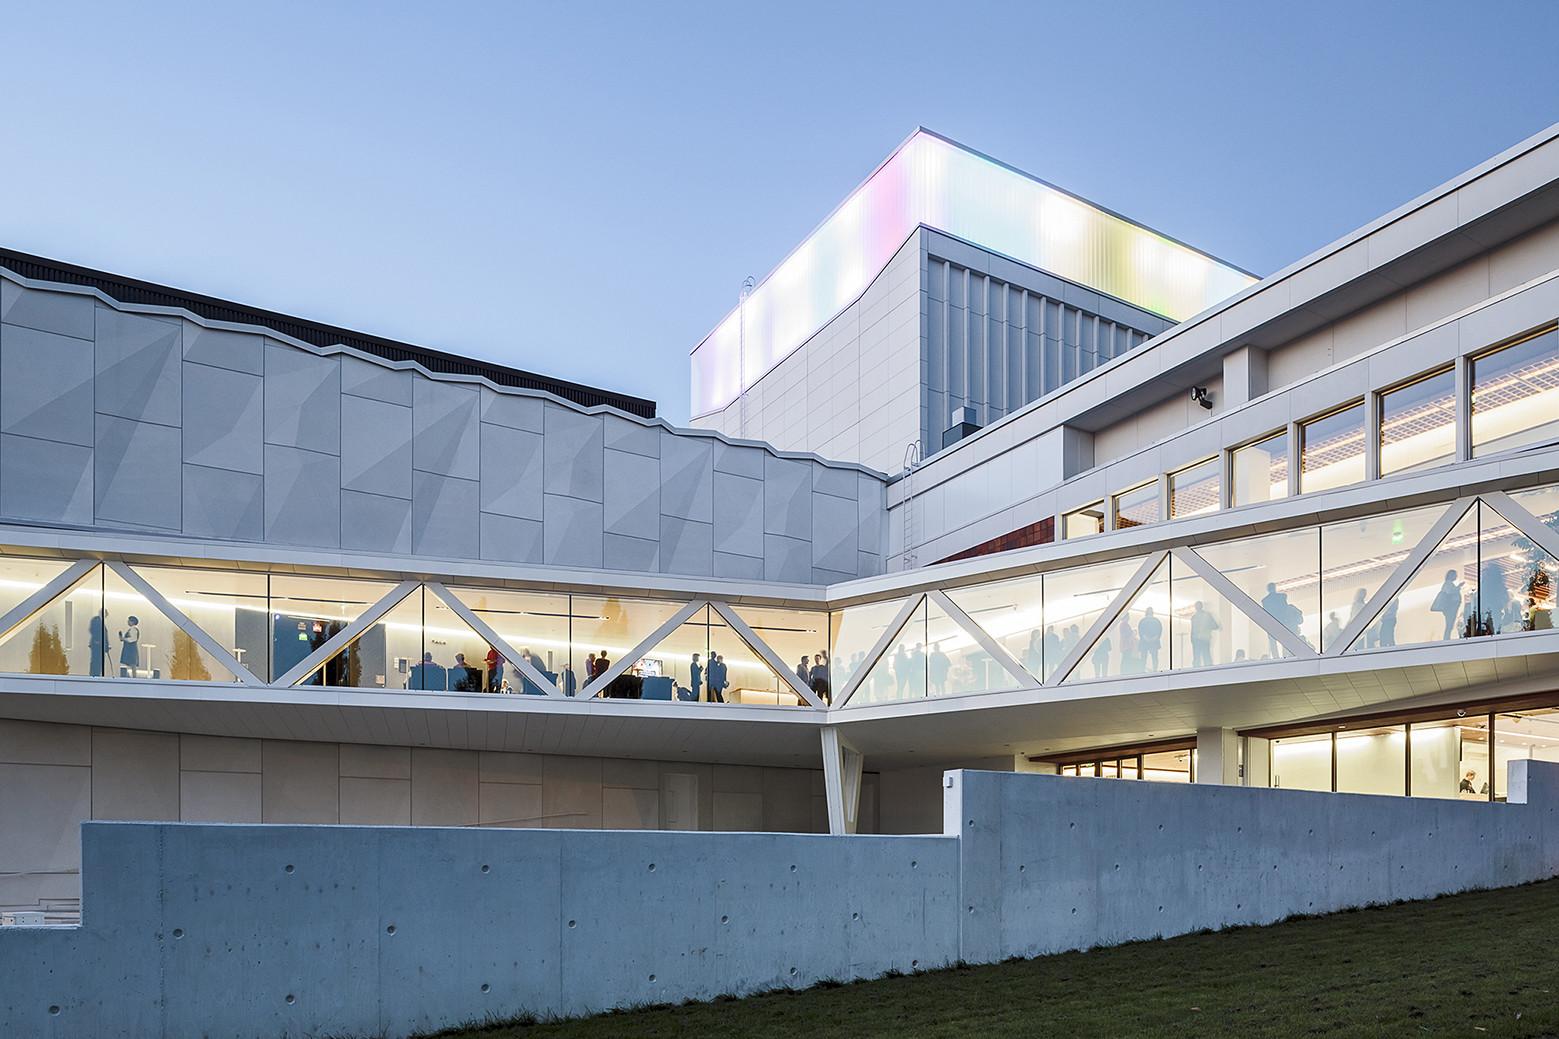 Kuopio City Theatre / ALA Architects, © Tuomas Uusheimo